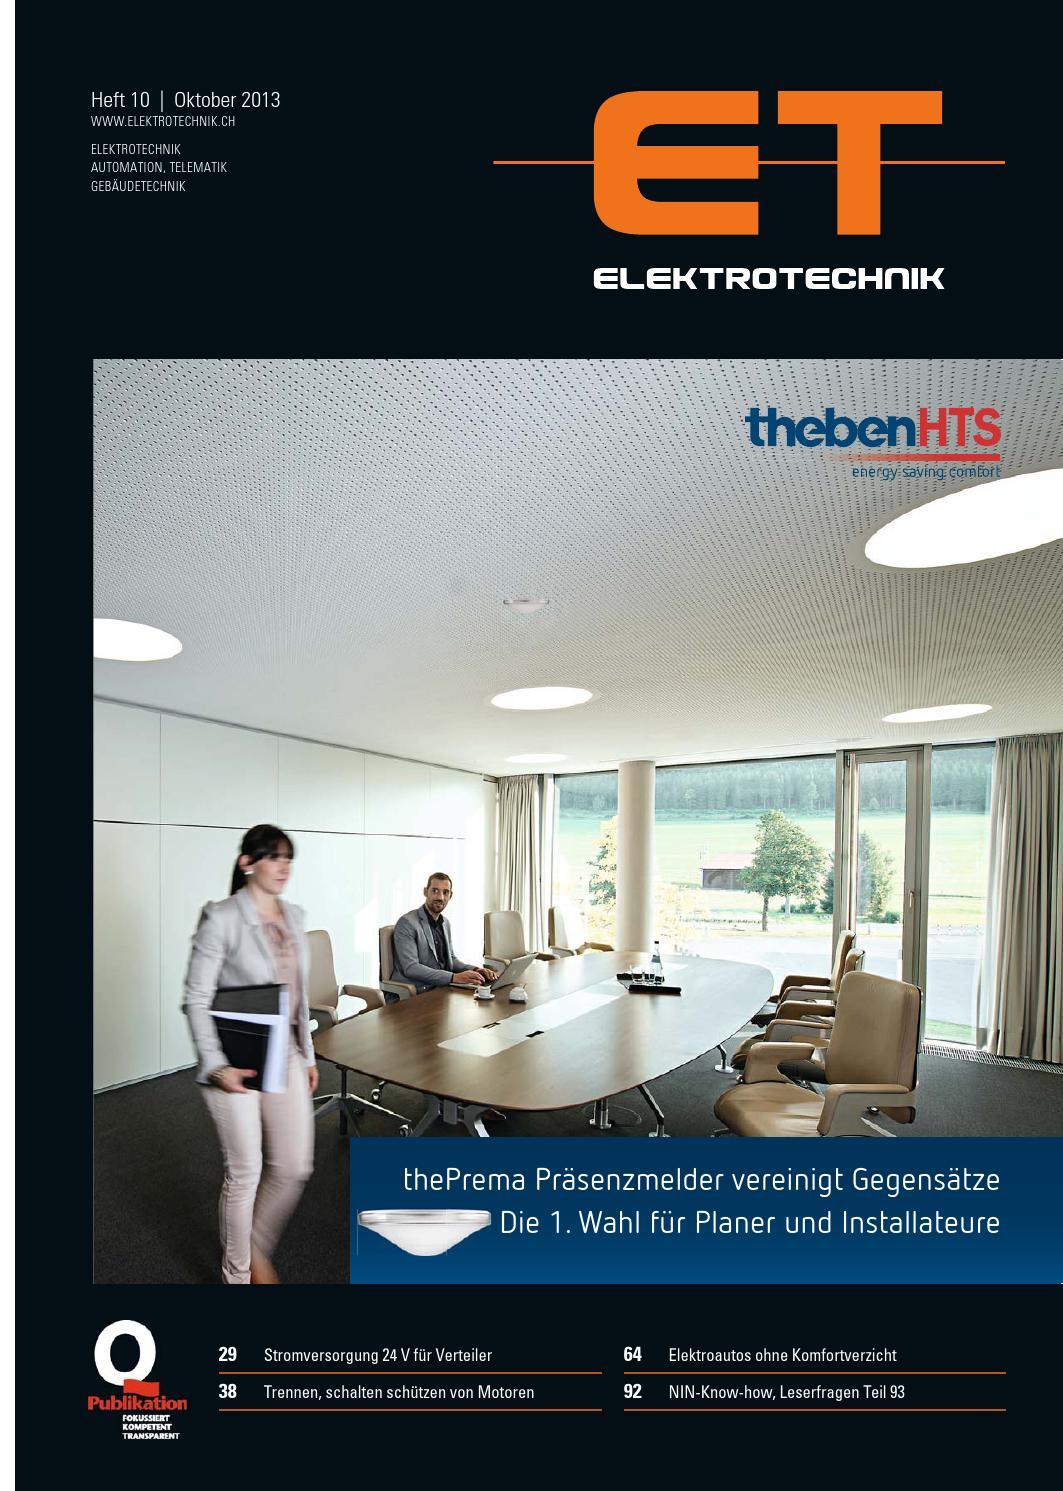 Elektrotechnik 10/2013 by AZ Fachverlage AG - issuu